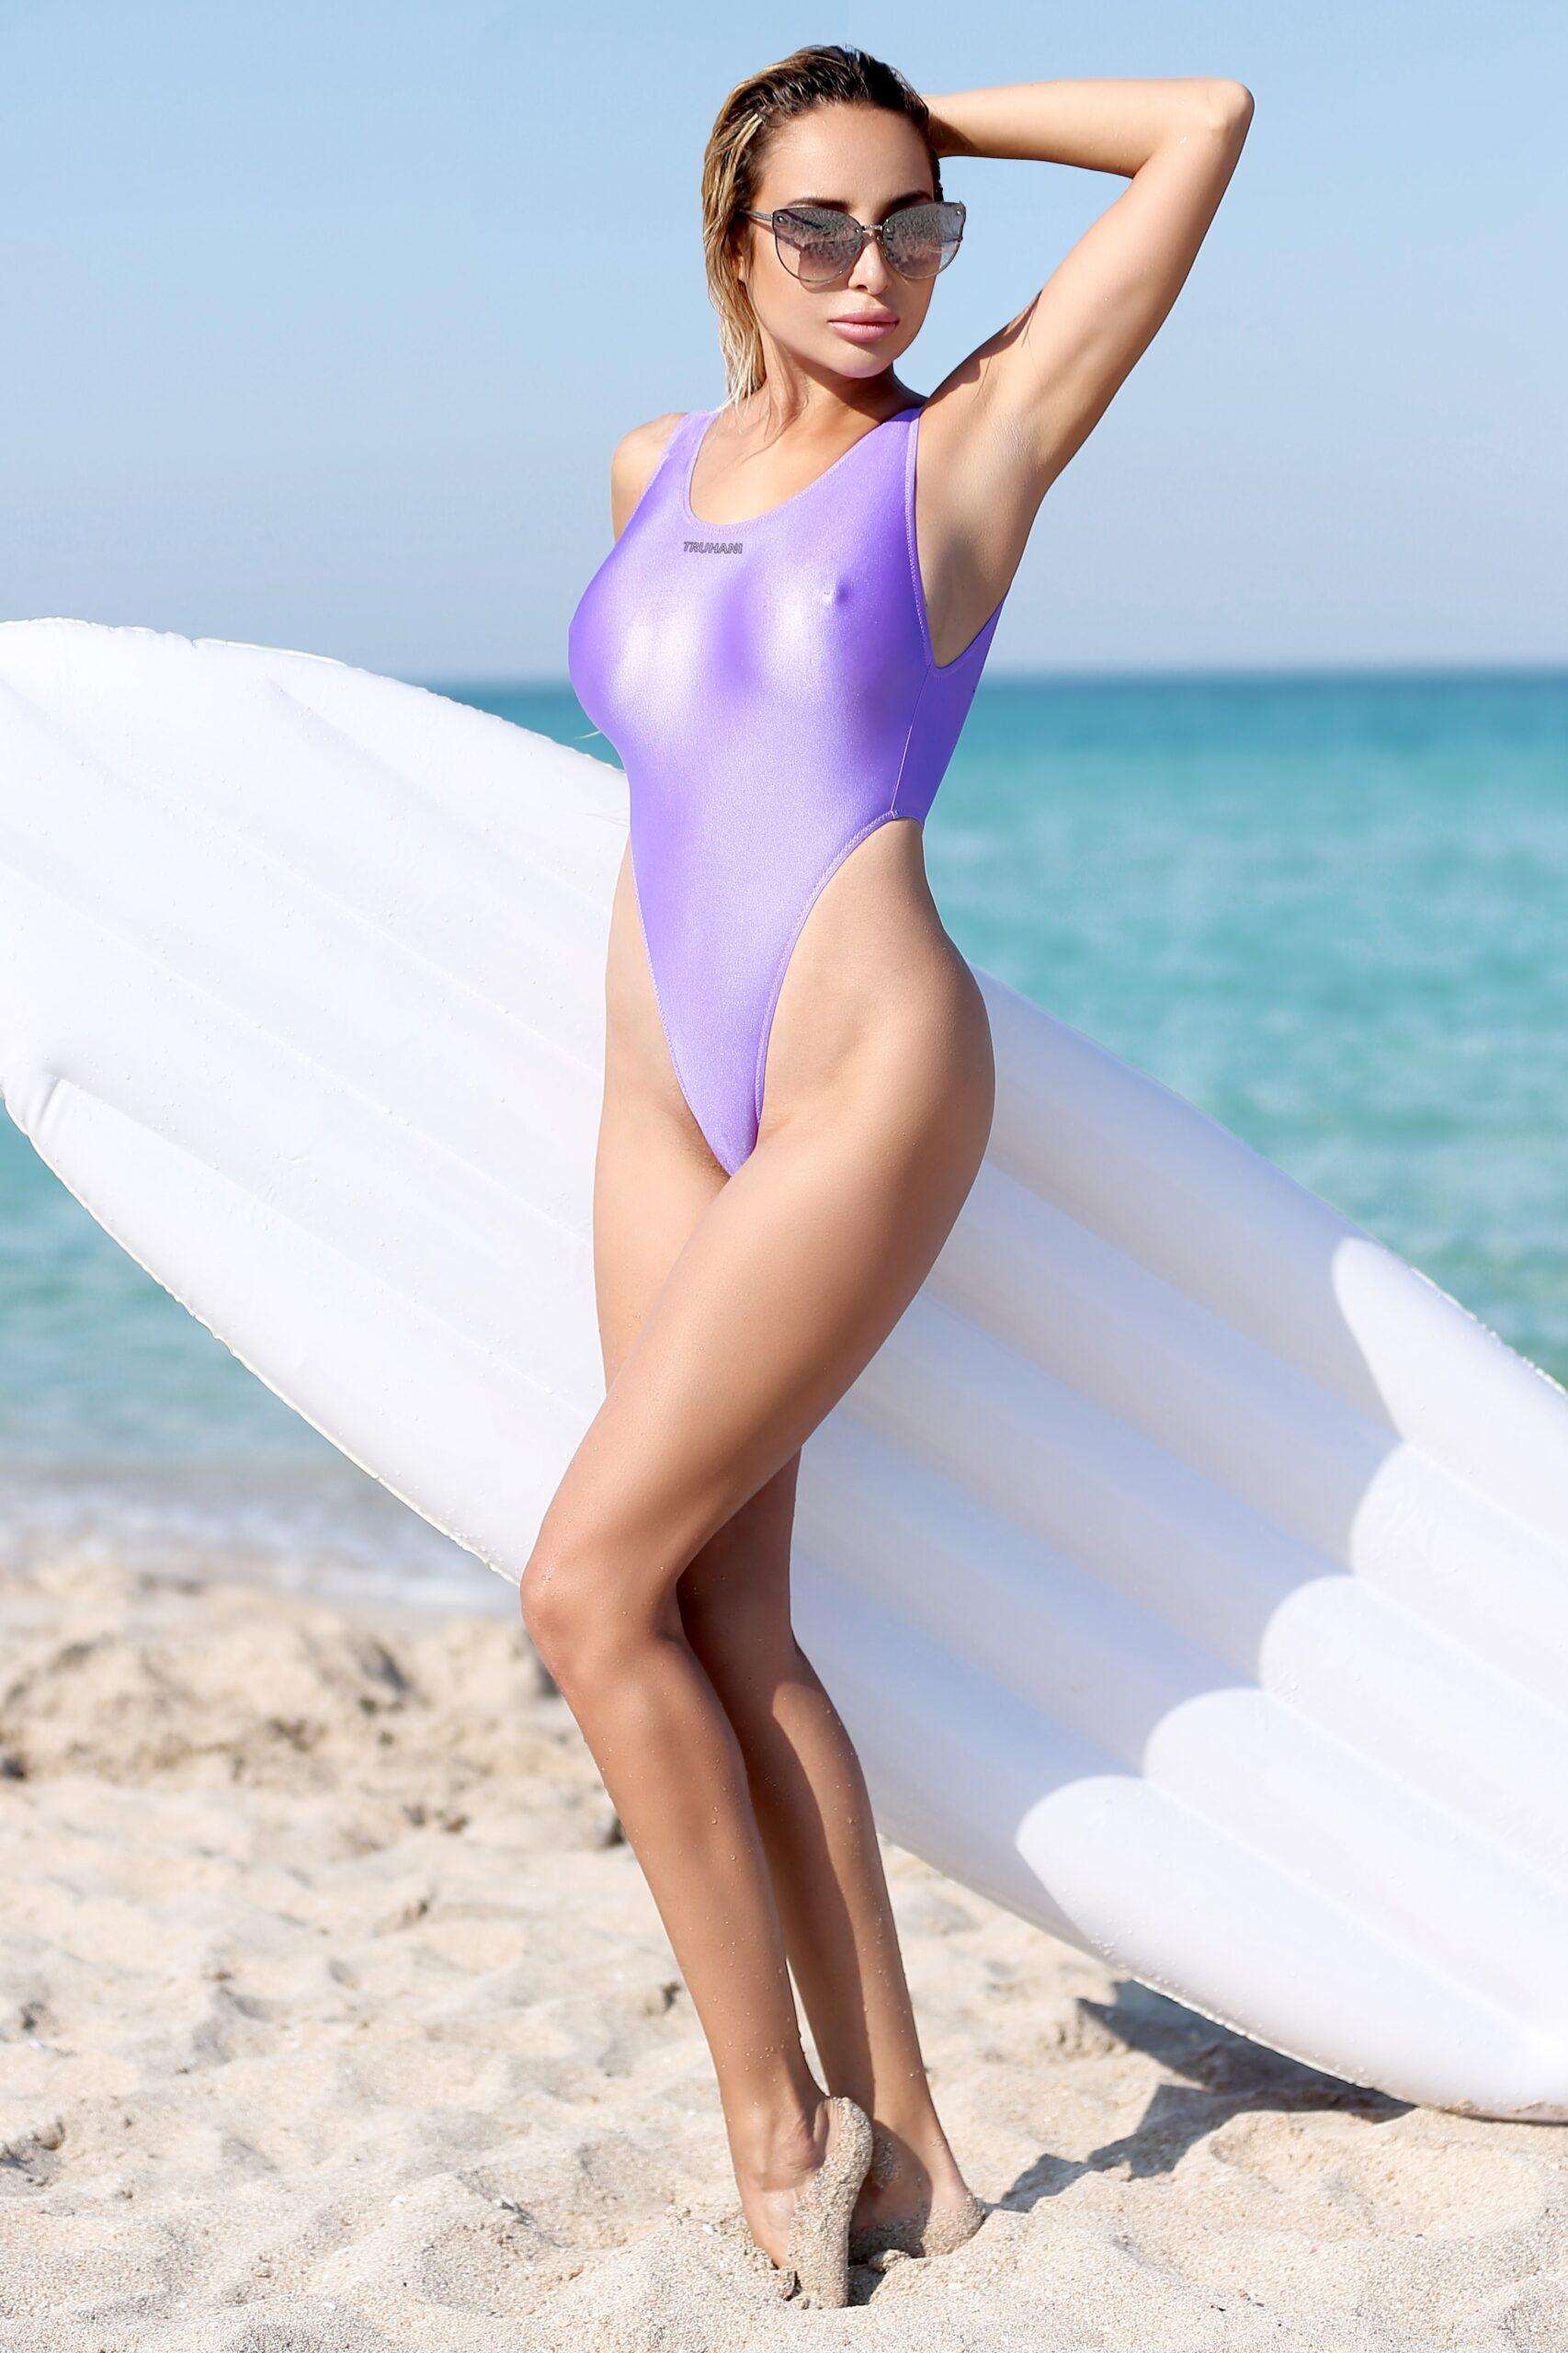 Sexy see through thong one piece swimsuit monokini. Extreme cheeky sheer when wet high cut leg bodysuit. Cute hot women designer swimwear.